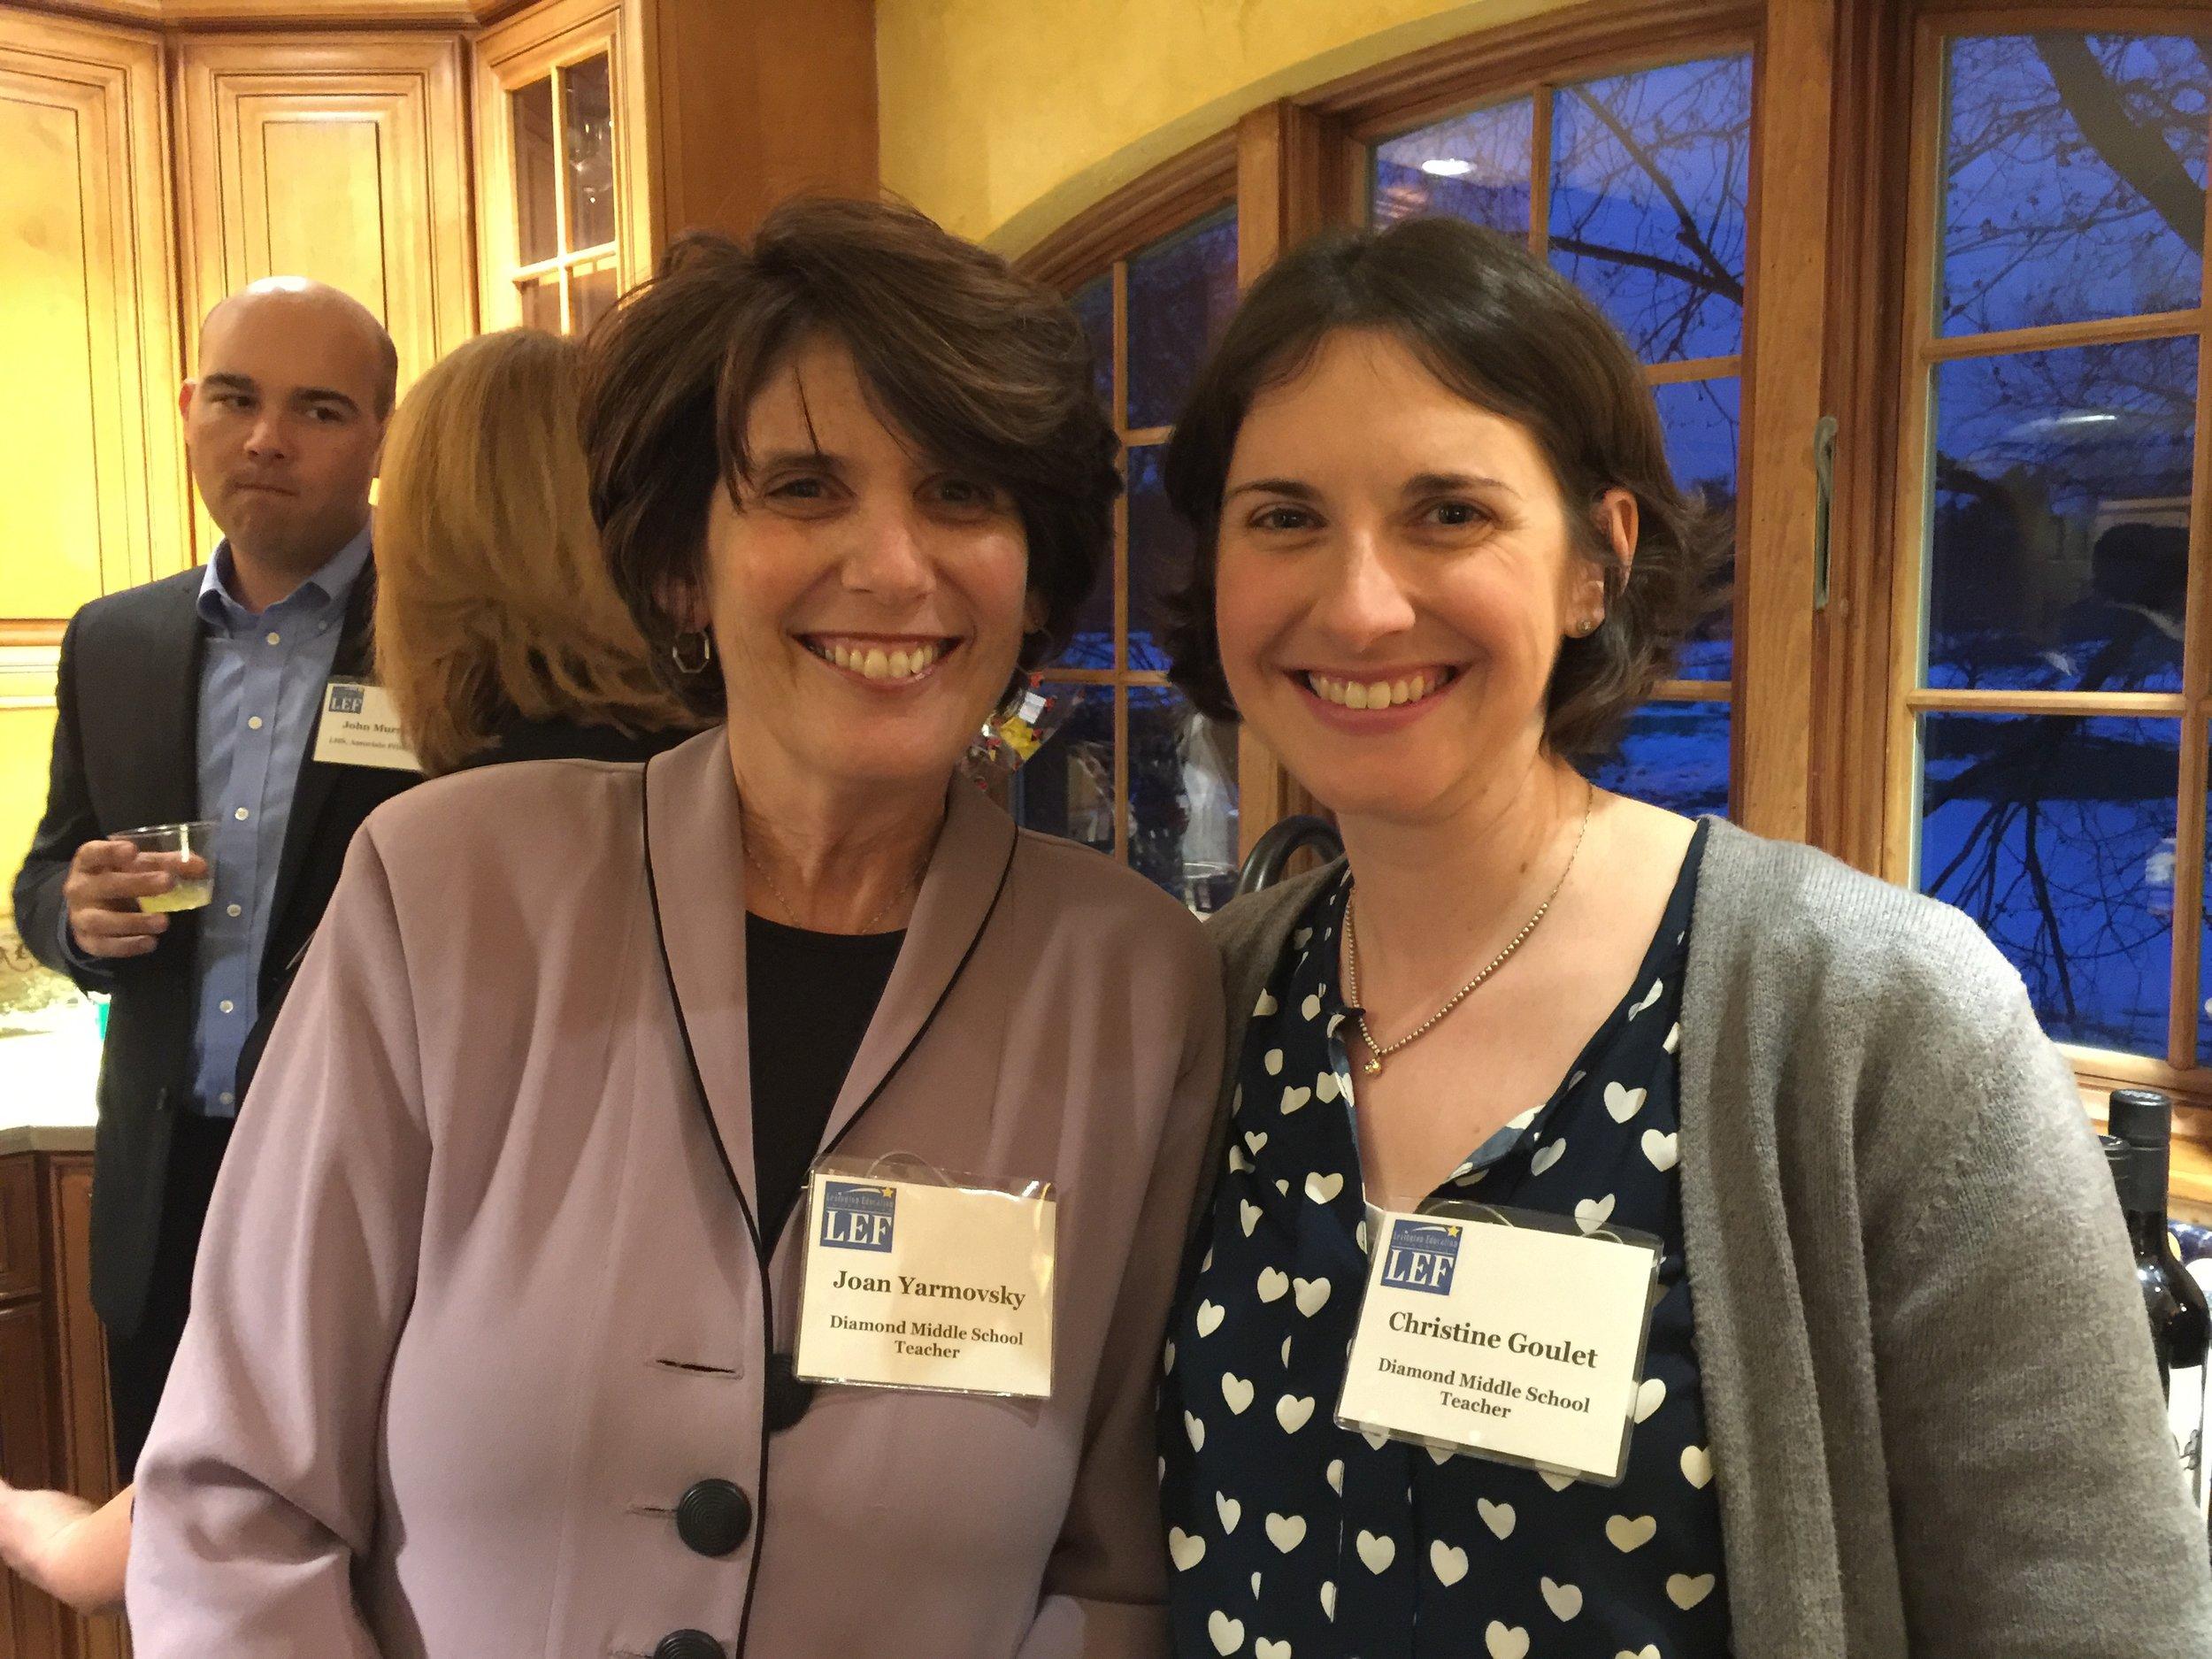 Joan Yarmousky & Christine Goulet, Diamond Middle School Teachers